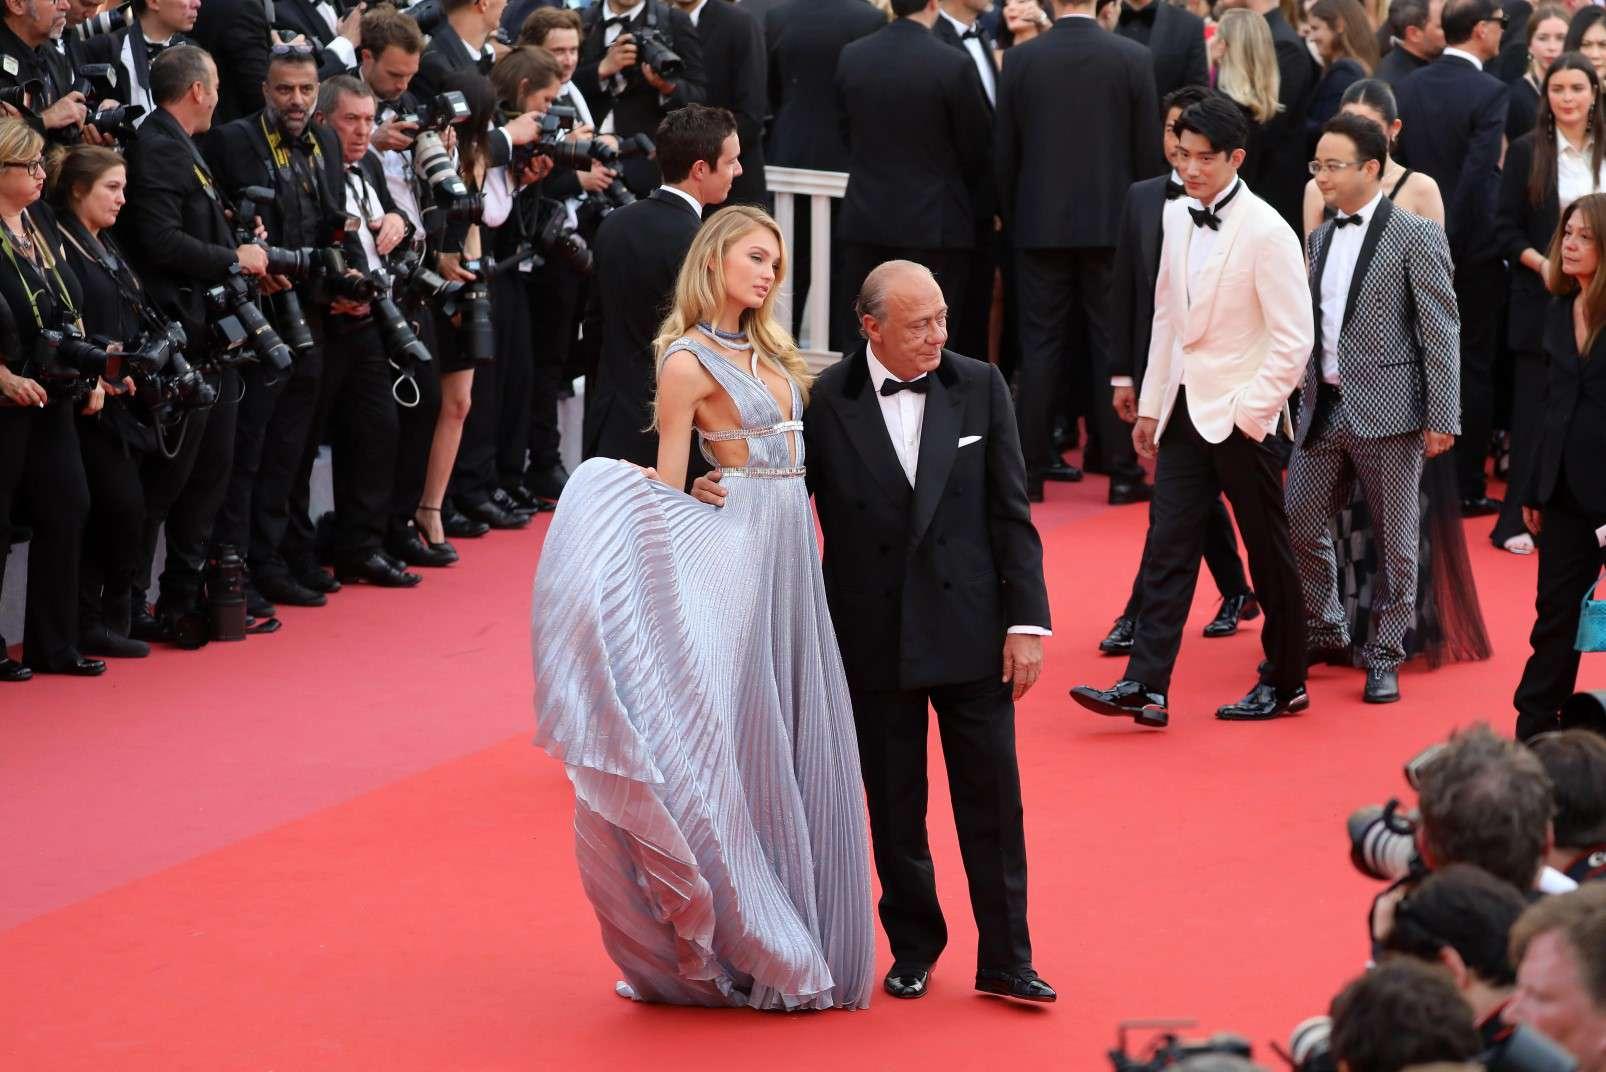 Cannes 2018, Romée Strijd wearing de Grisogono jewellery, with de Grisogono CEO Fawaz Gruosi, photo courtesy of de Grisogono